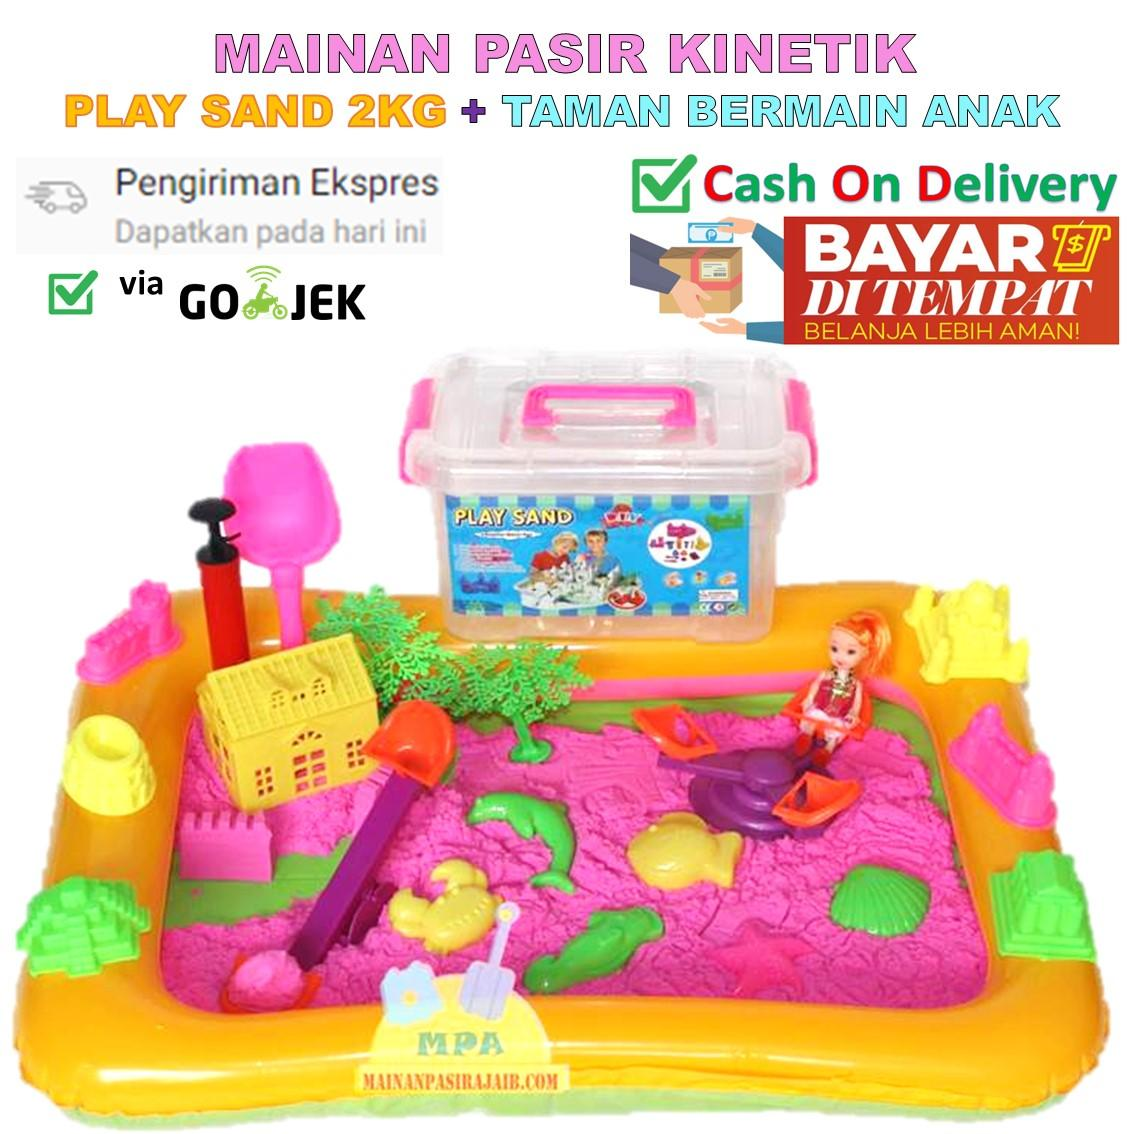 Mainan Pasir Ajaib Magic Sand Play Sand 2 Kg dengan Taman Bermain Anak 74f5d9f8fe